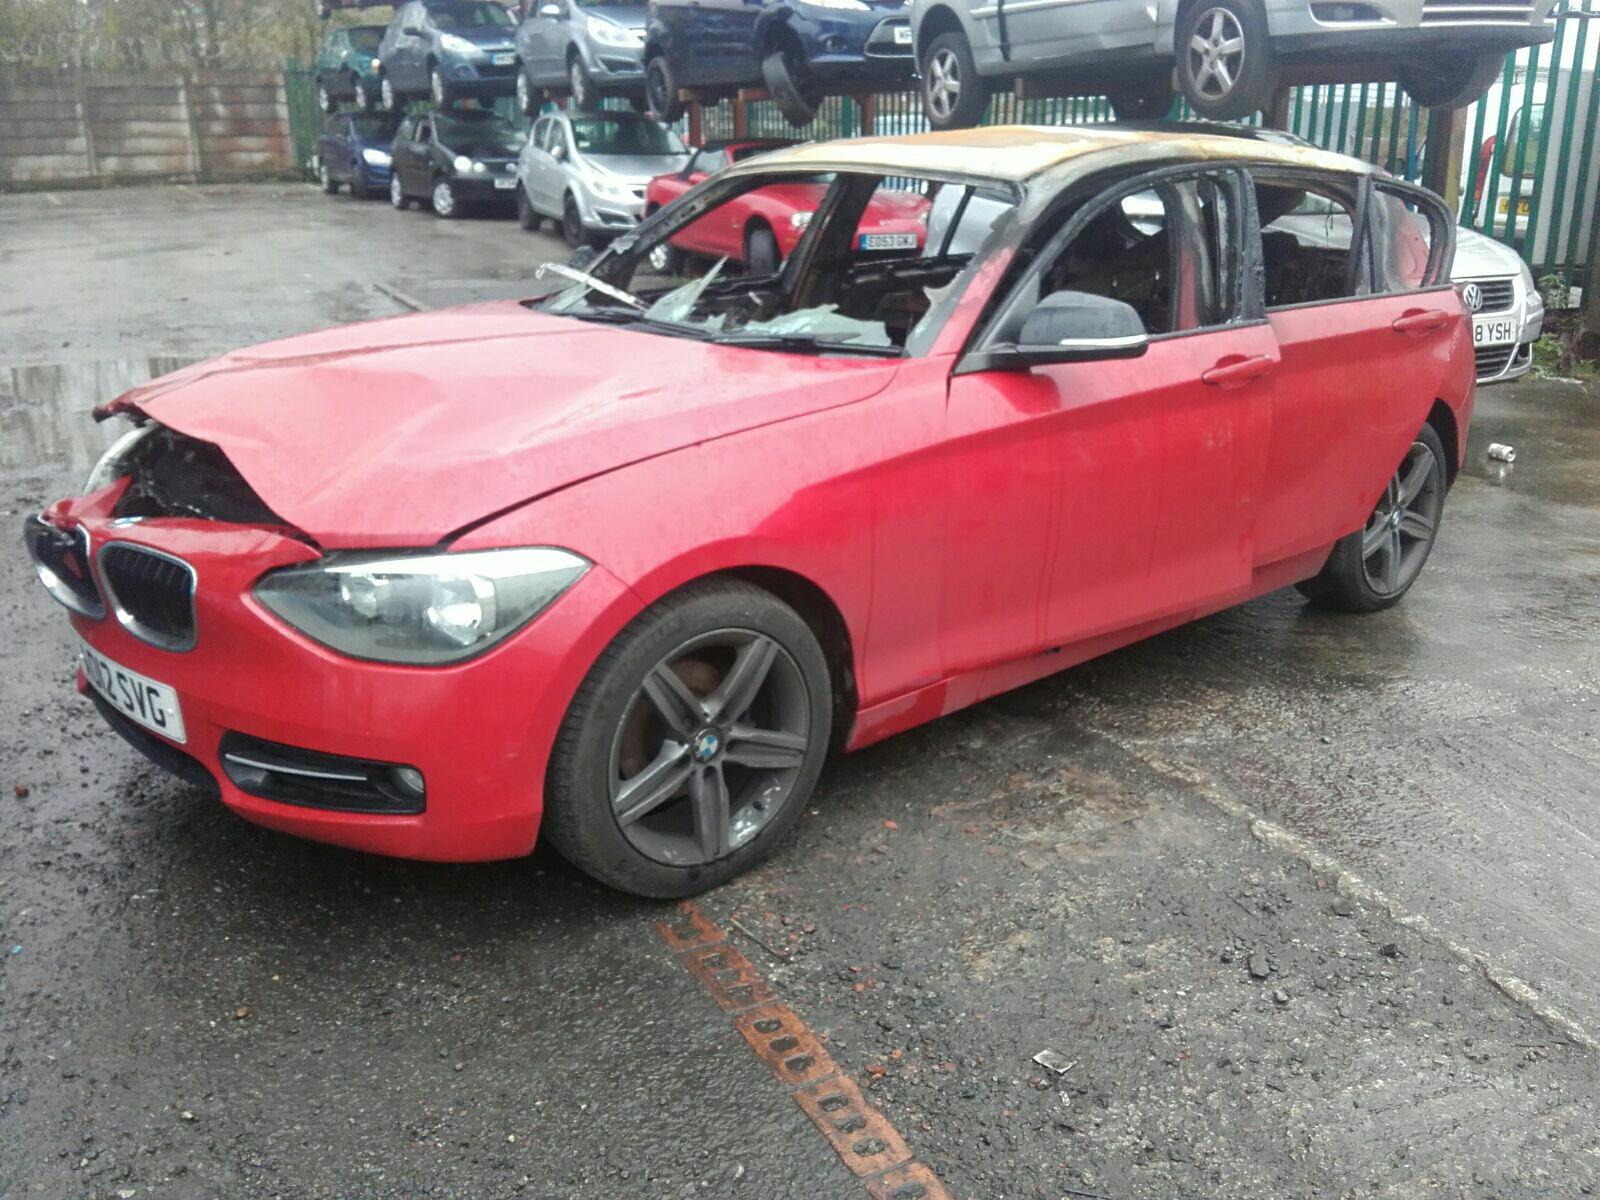 2012 bmw 1 series 2011 to 2015 5 door hatchback petrol manual rh motorhog co uk BMW 128I Body Kit BMW 128I Custom